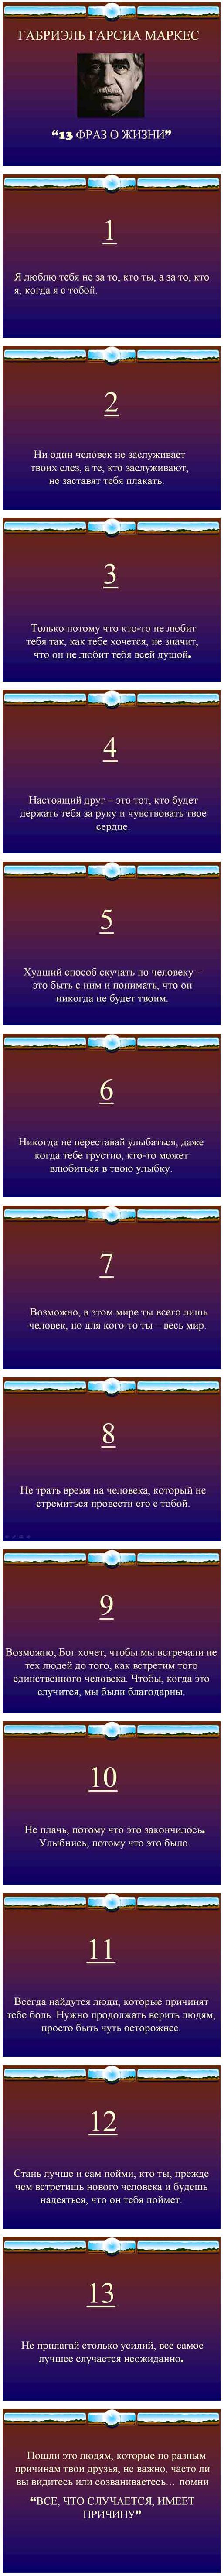 image45526484.jpg